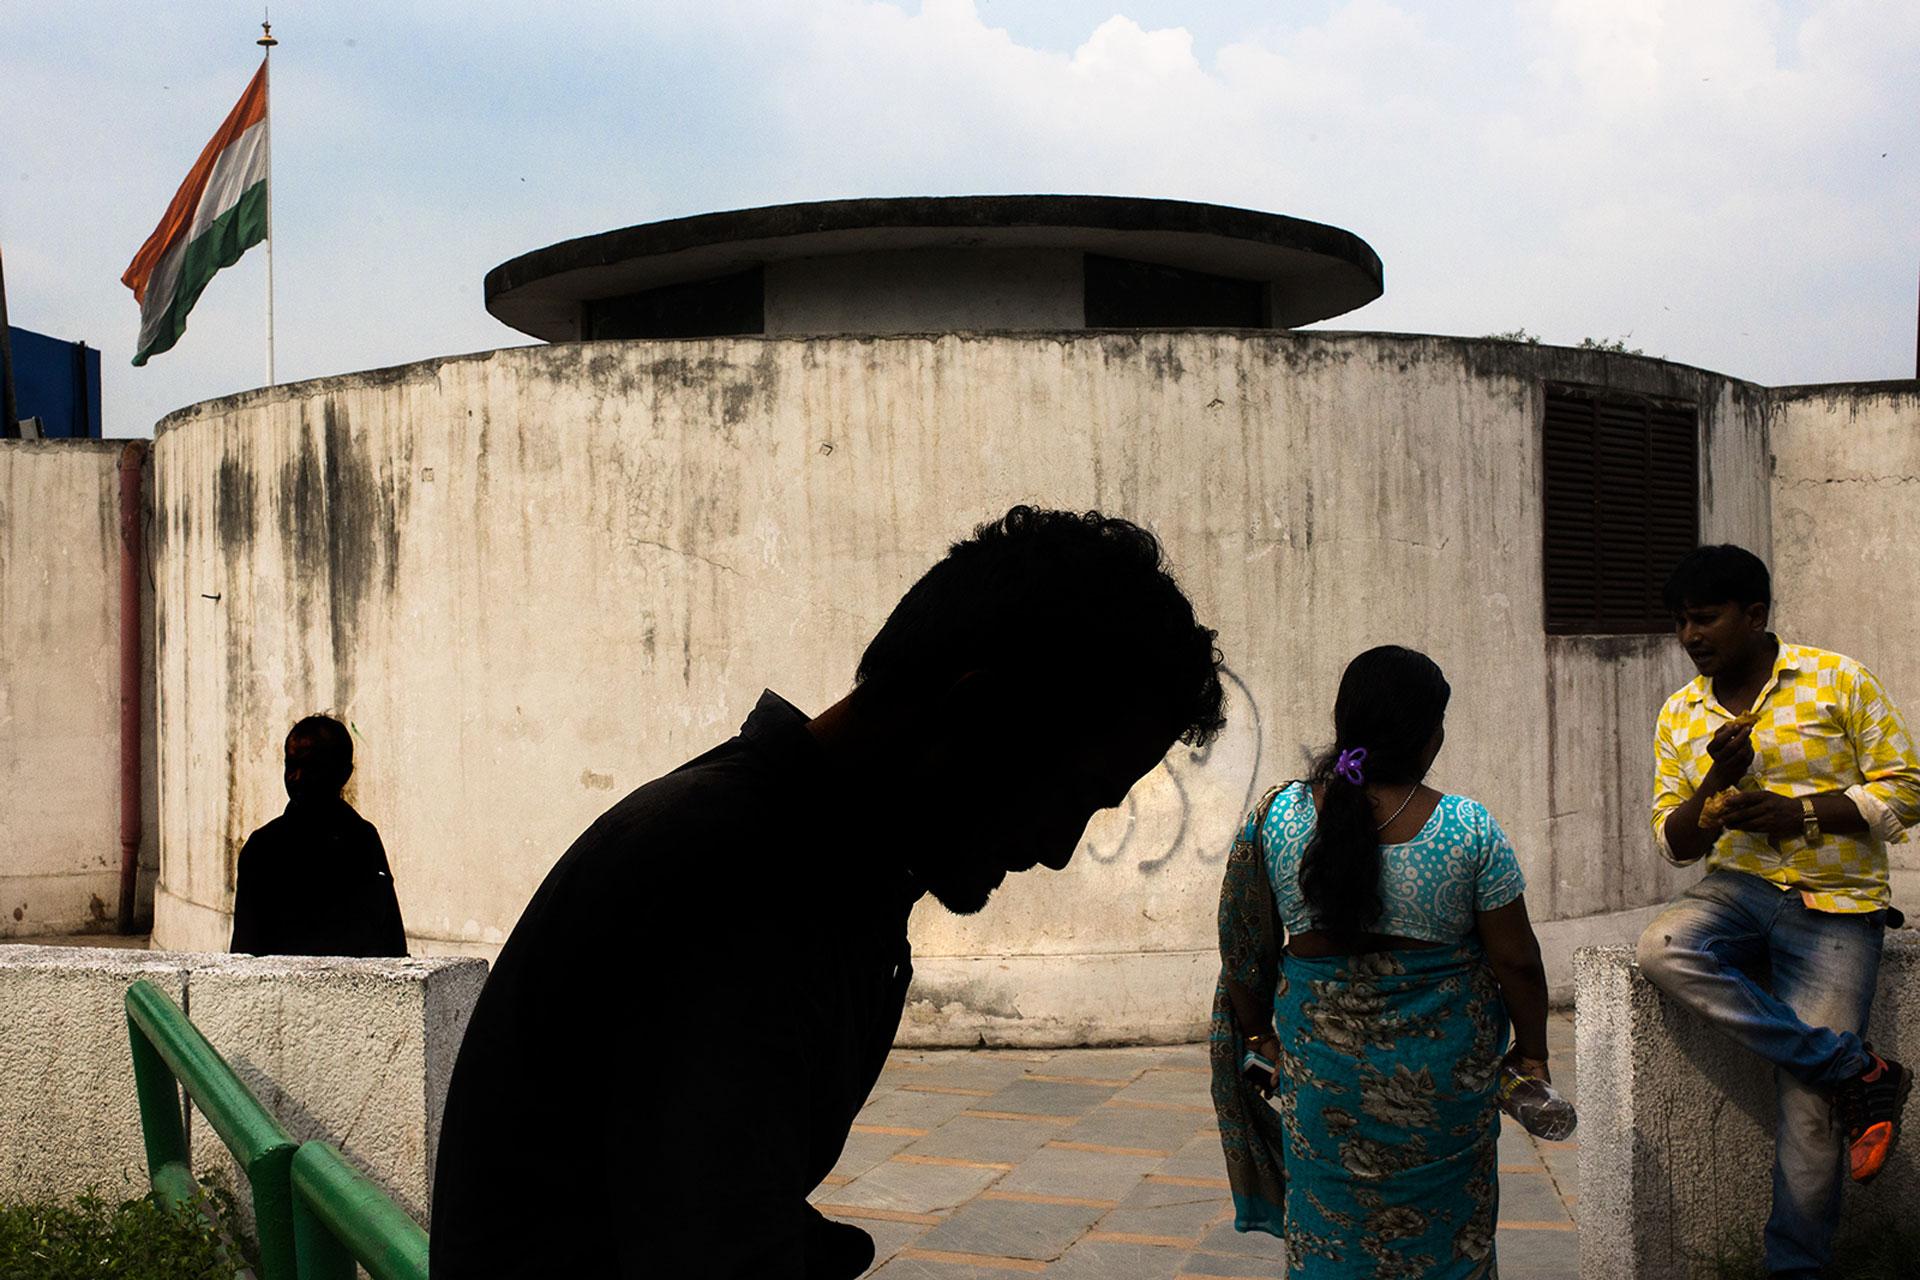 Street Photography in India by Pushkar Raj Sharma: Silhoutte of a man walking in the shadow